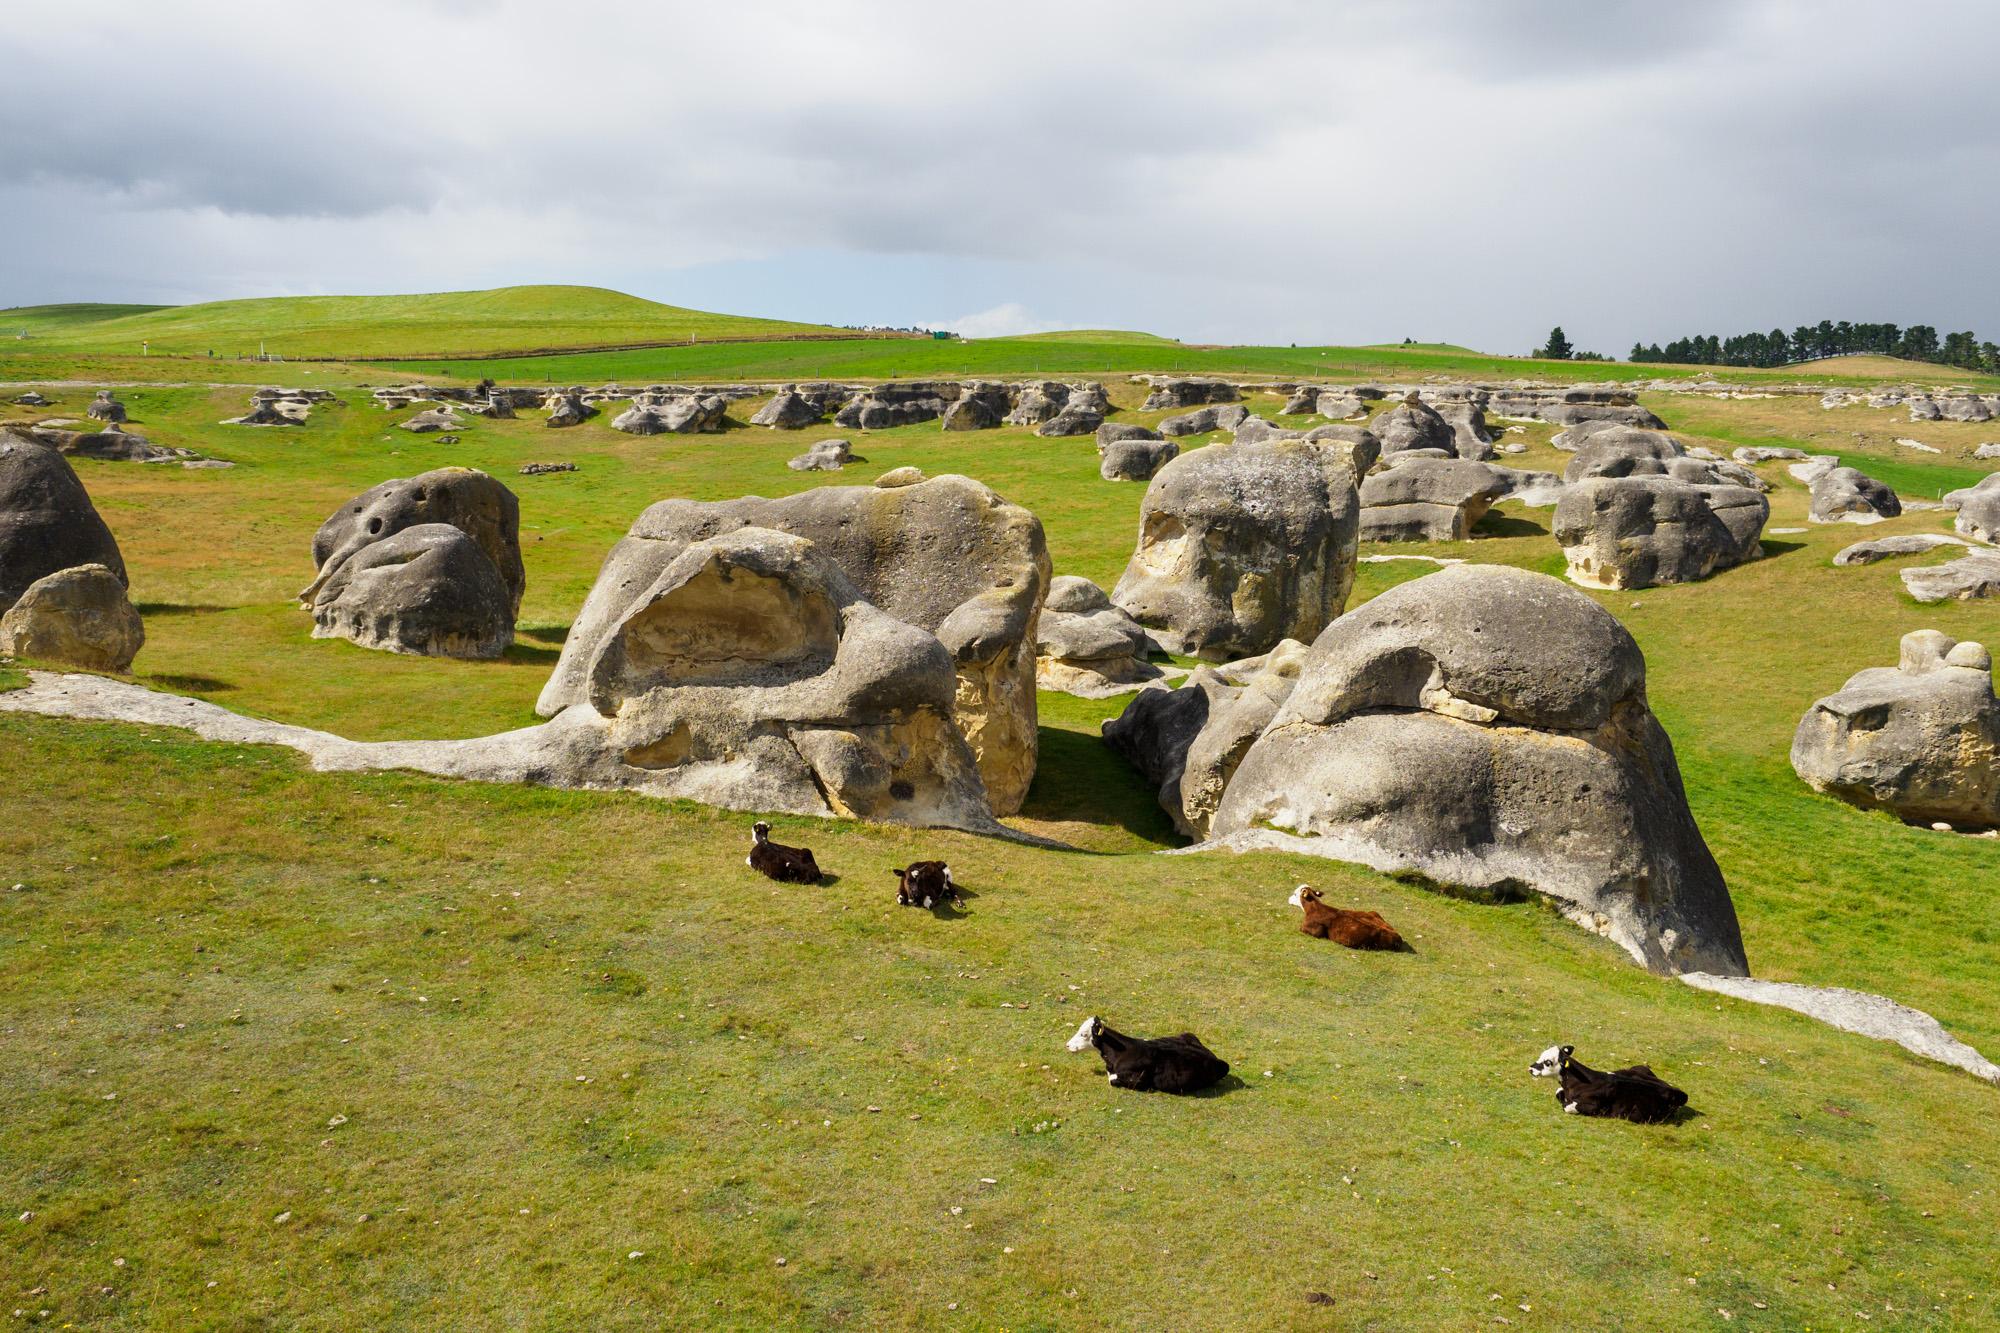 Aoraki Mt Cook Nationalpark - Elephant Rocks